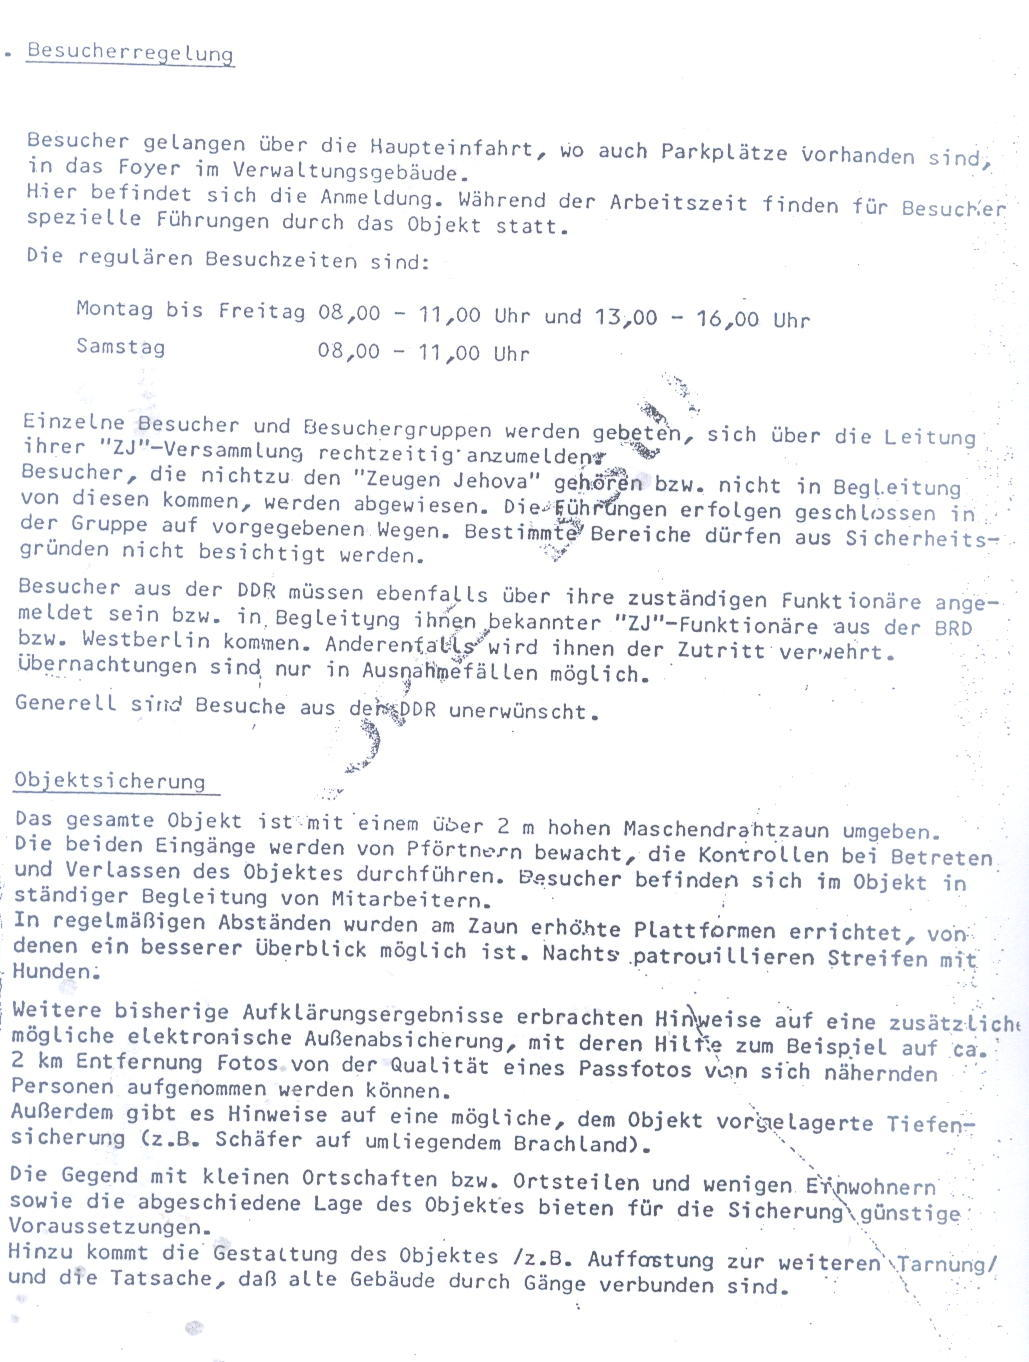 http://www.manfred-gebhard.de/Sachstand114.jpg